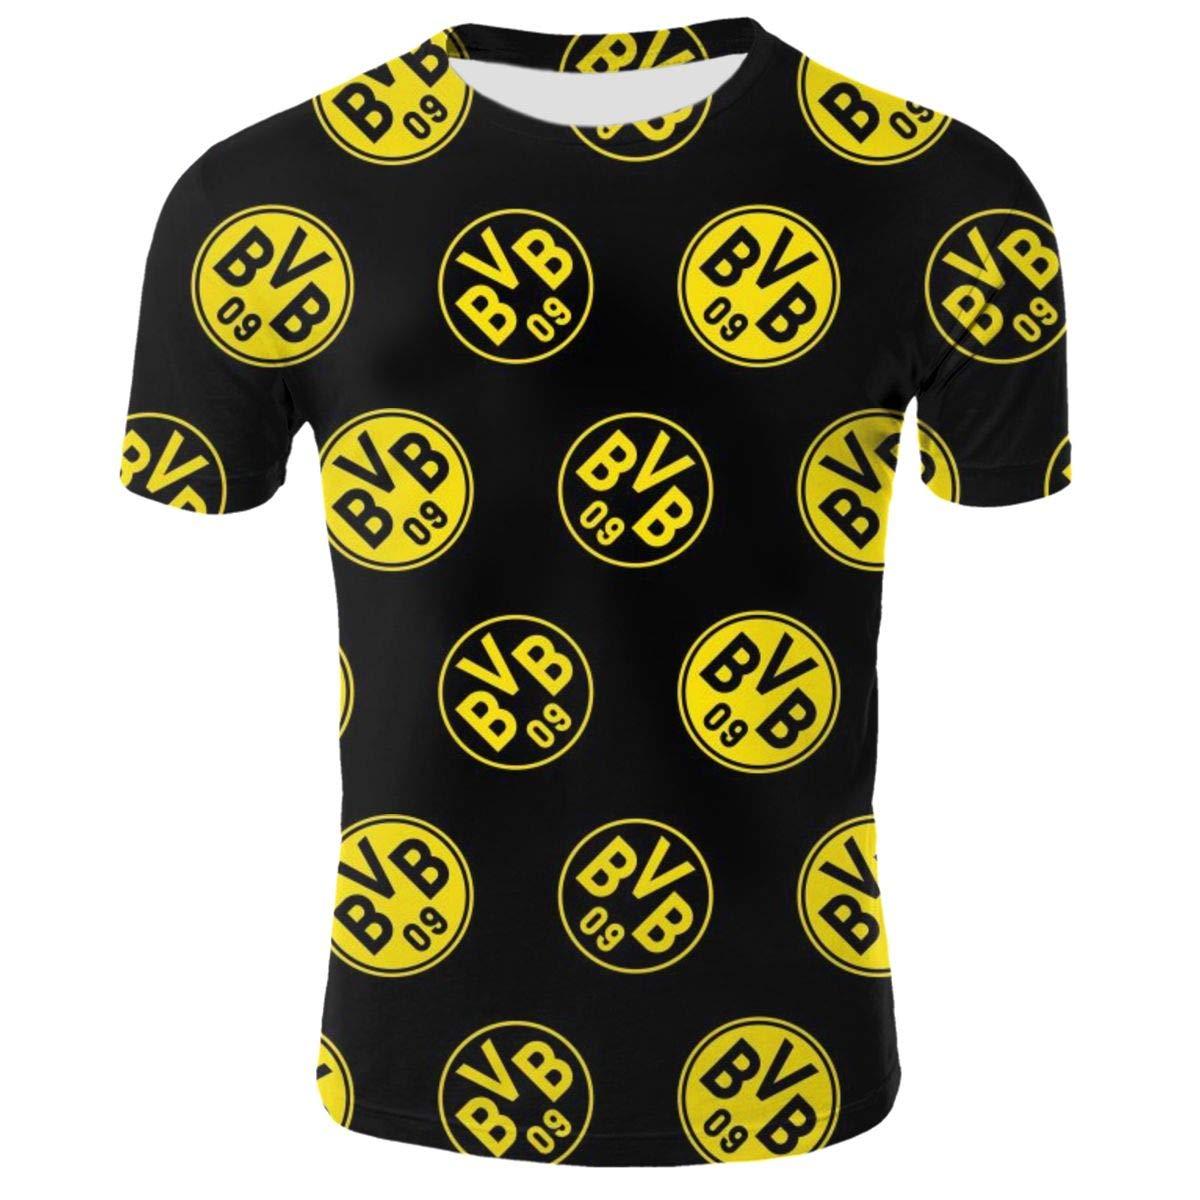 Borussia Dortmund BVB Herren T-Shirt Sommer Manner Crow Tee Short Sleeve